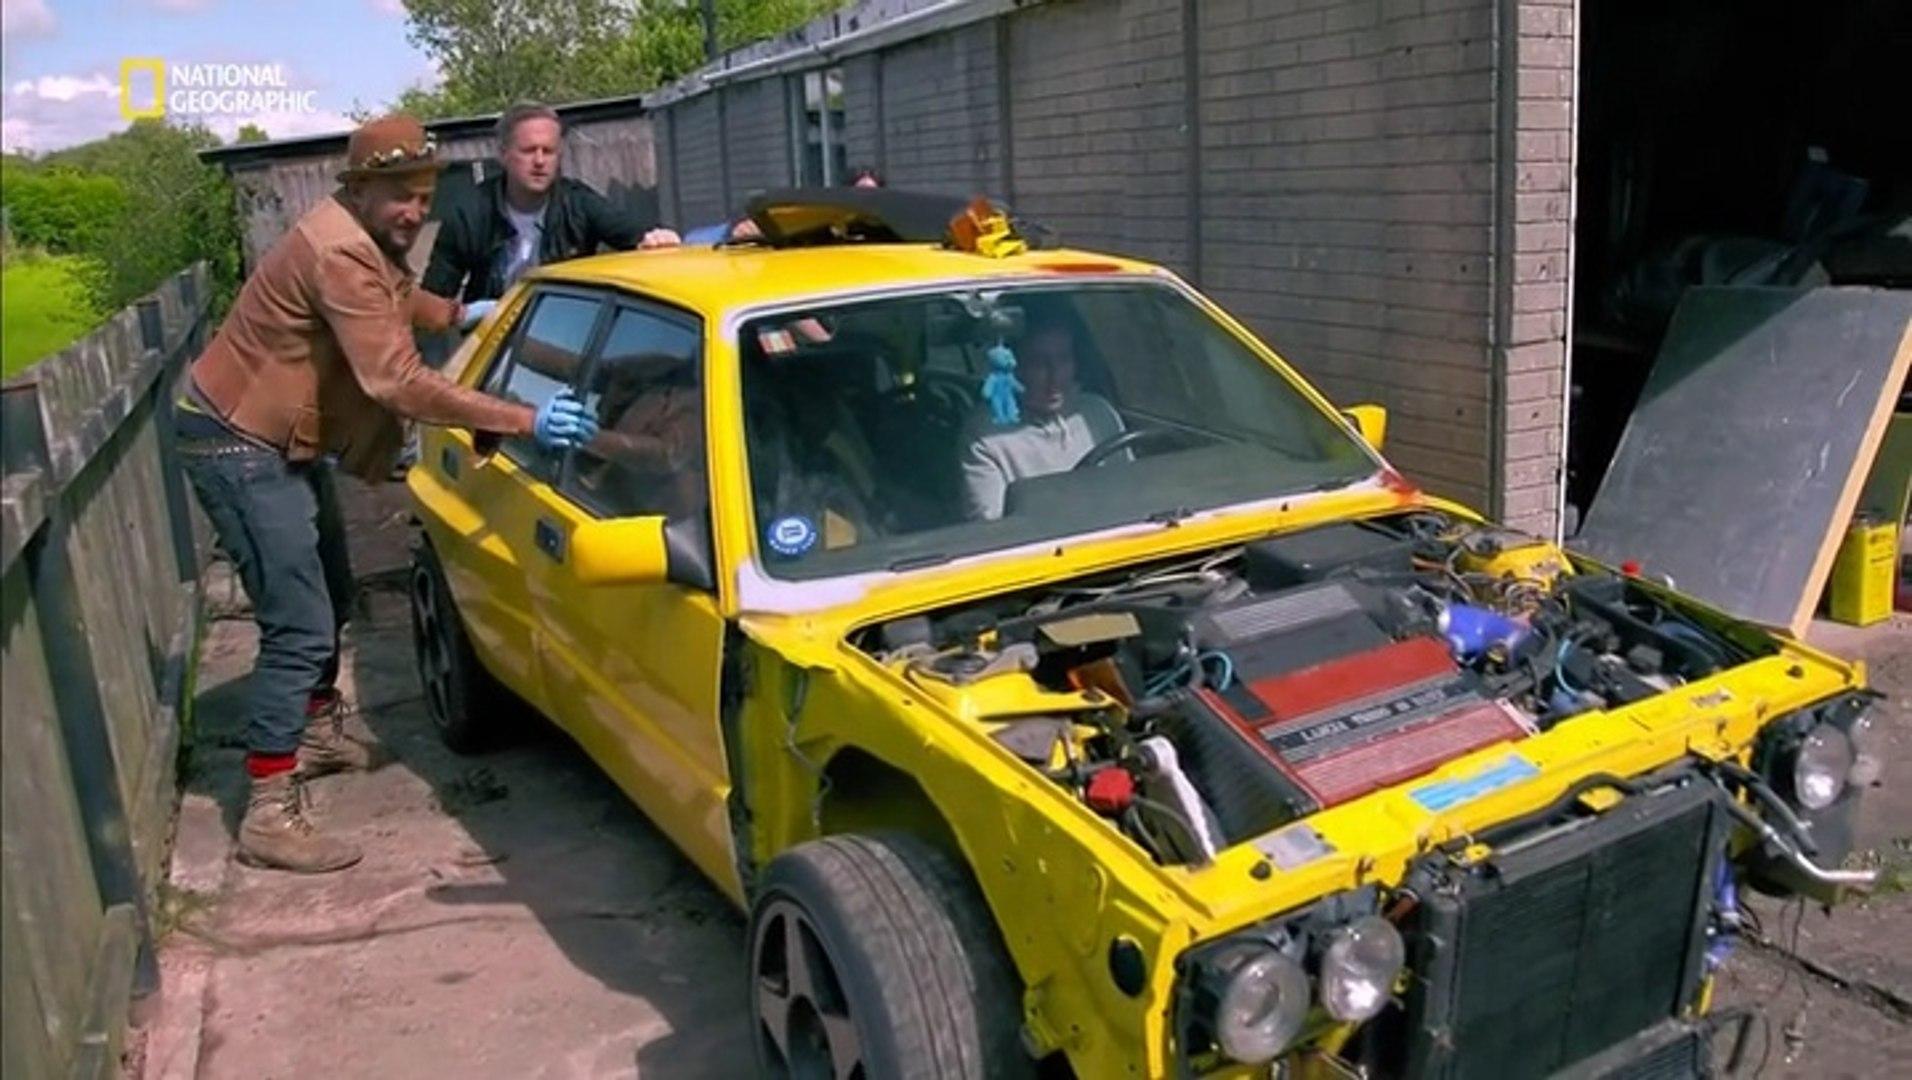 cars hrvatski torrent - cars hrvatski torrent